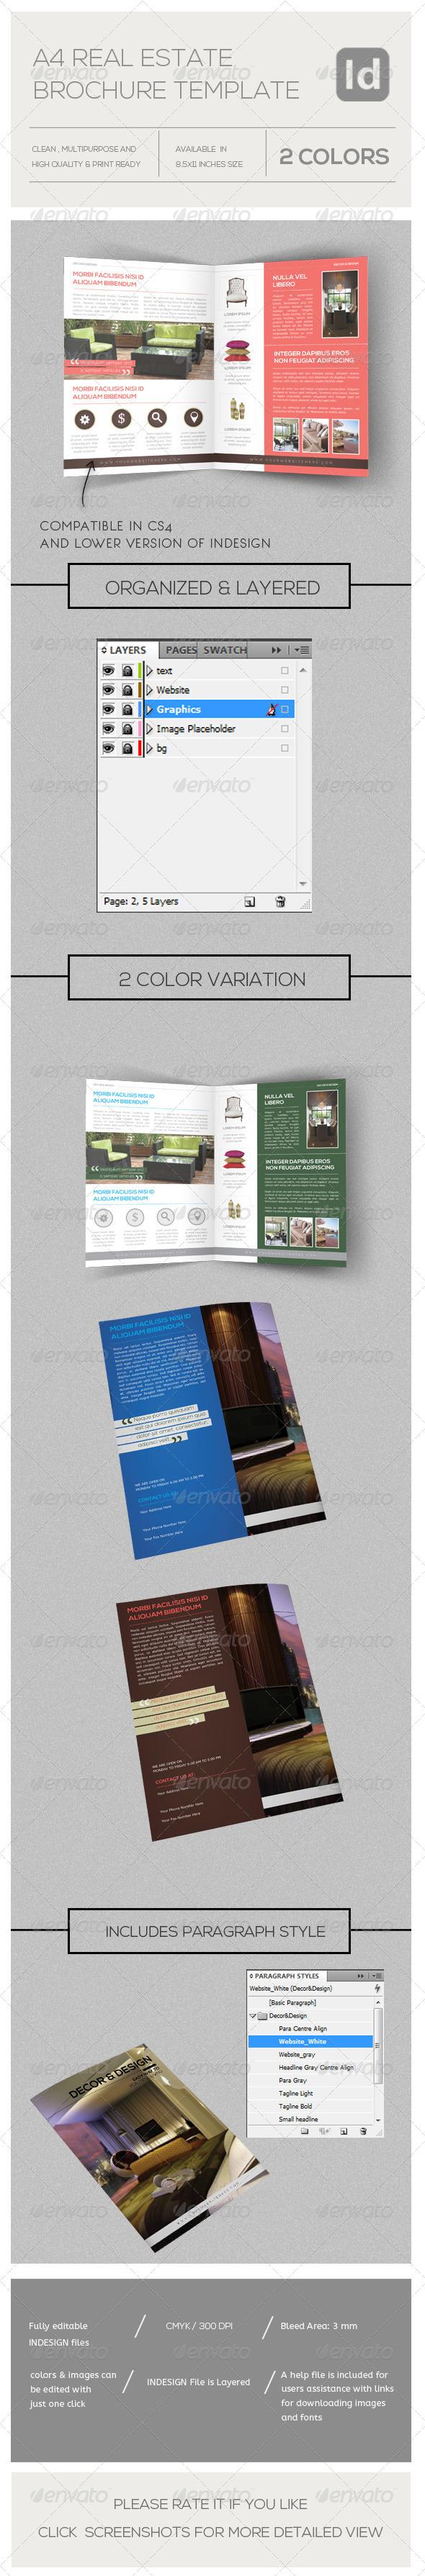 Real Estate Business Bi-fold Brochure - Brochures Print Templates